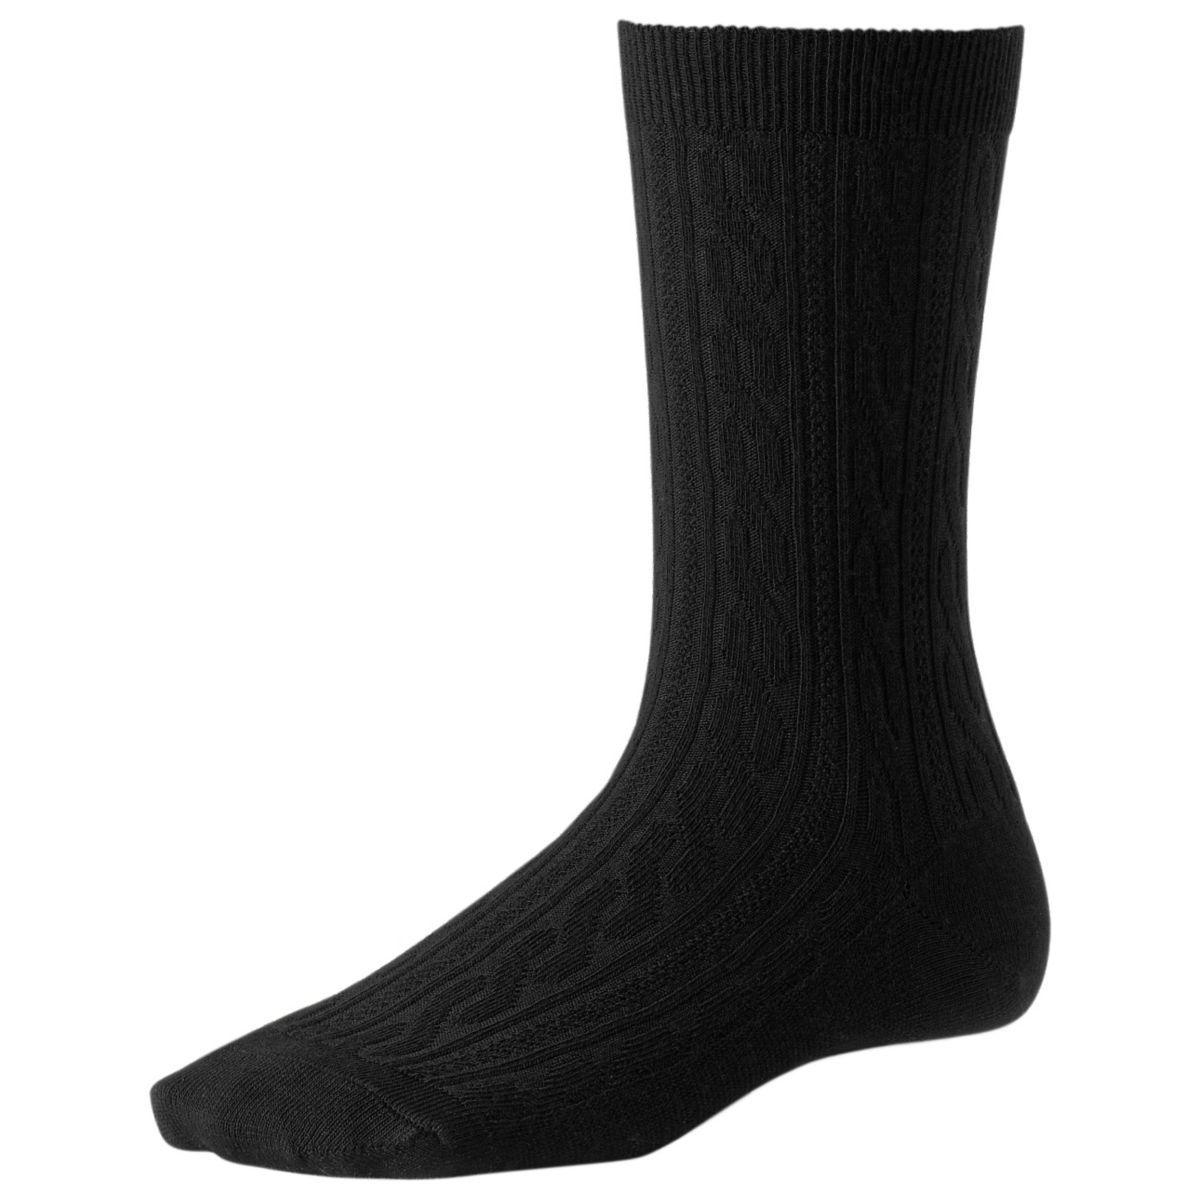 Smartwool Women's Cable Ii Crew Socks - Black, S